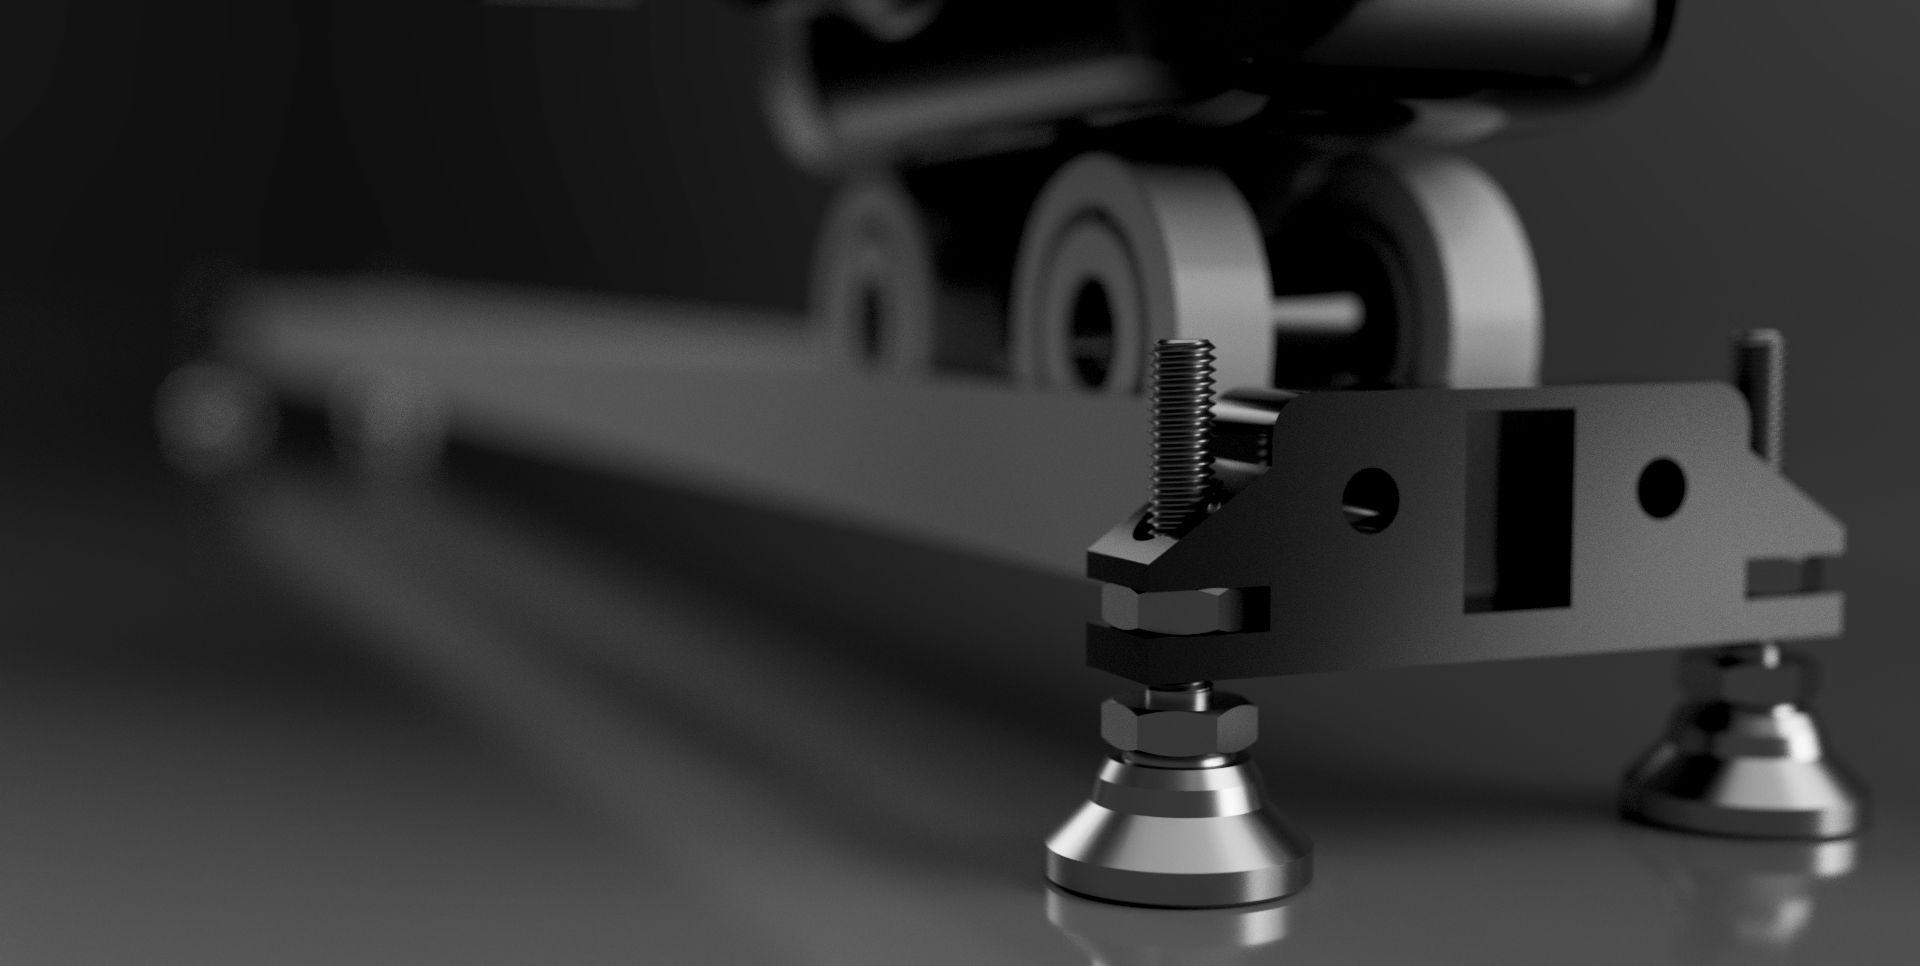 Camera-slide-rail-v7-2-3500-3500